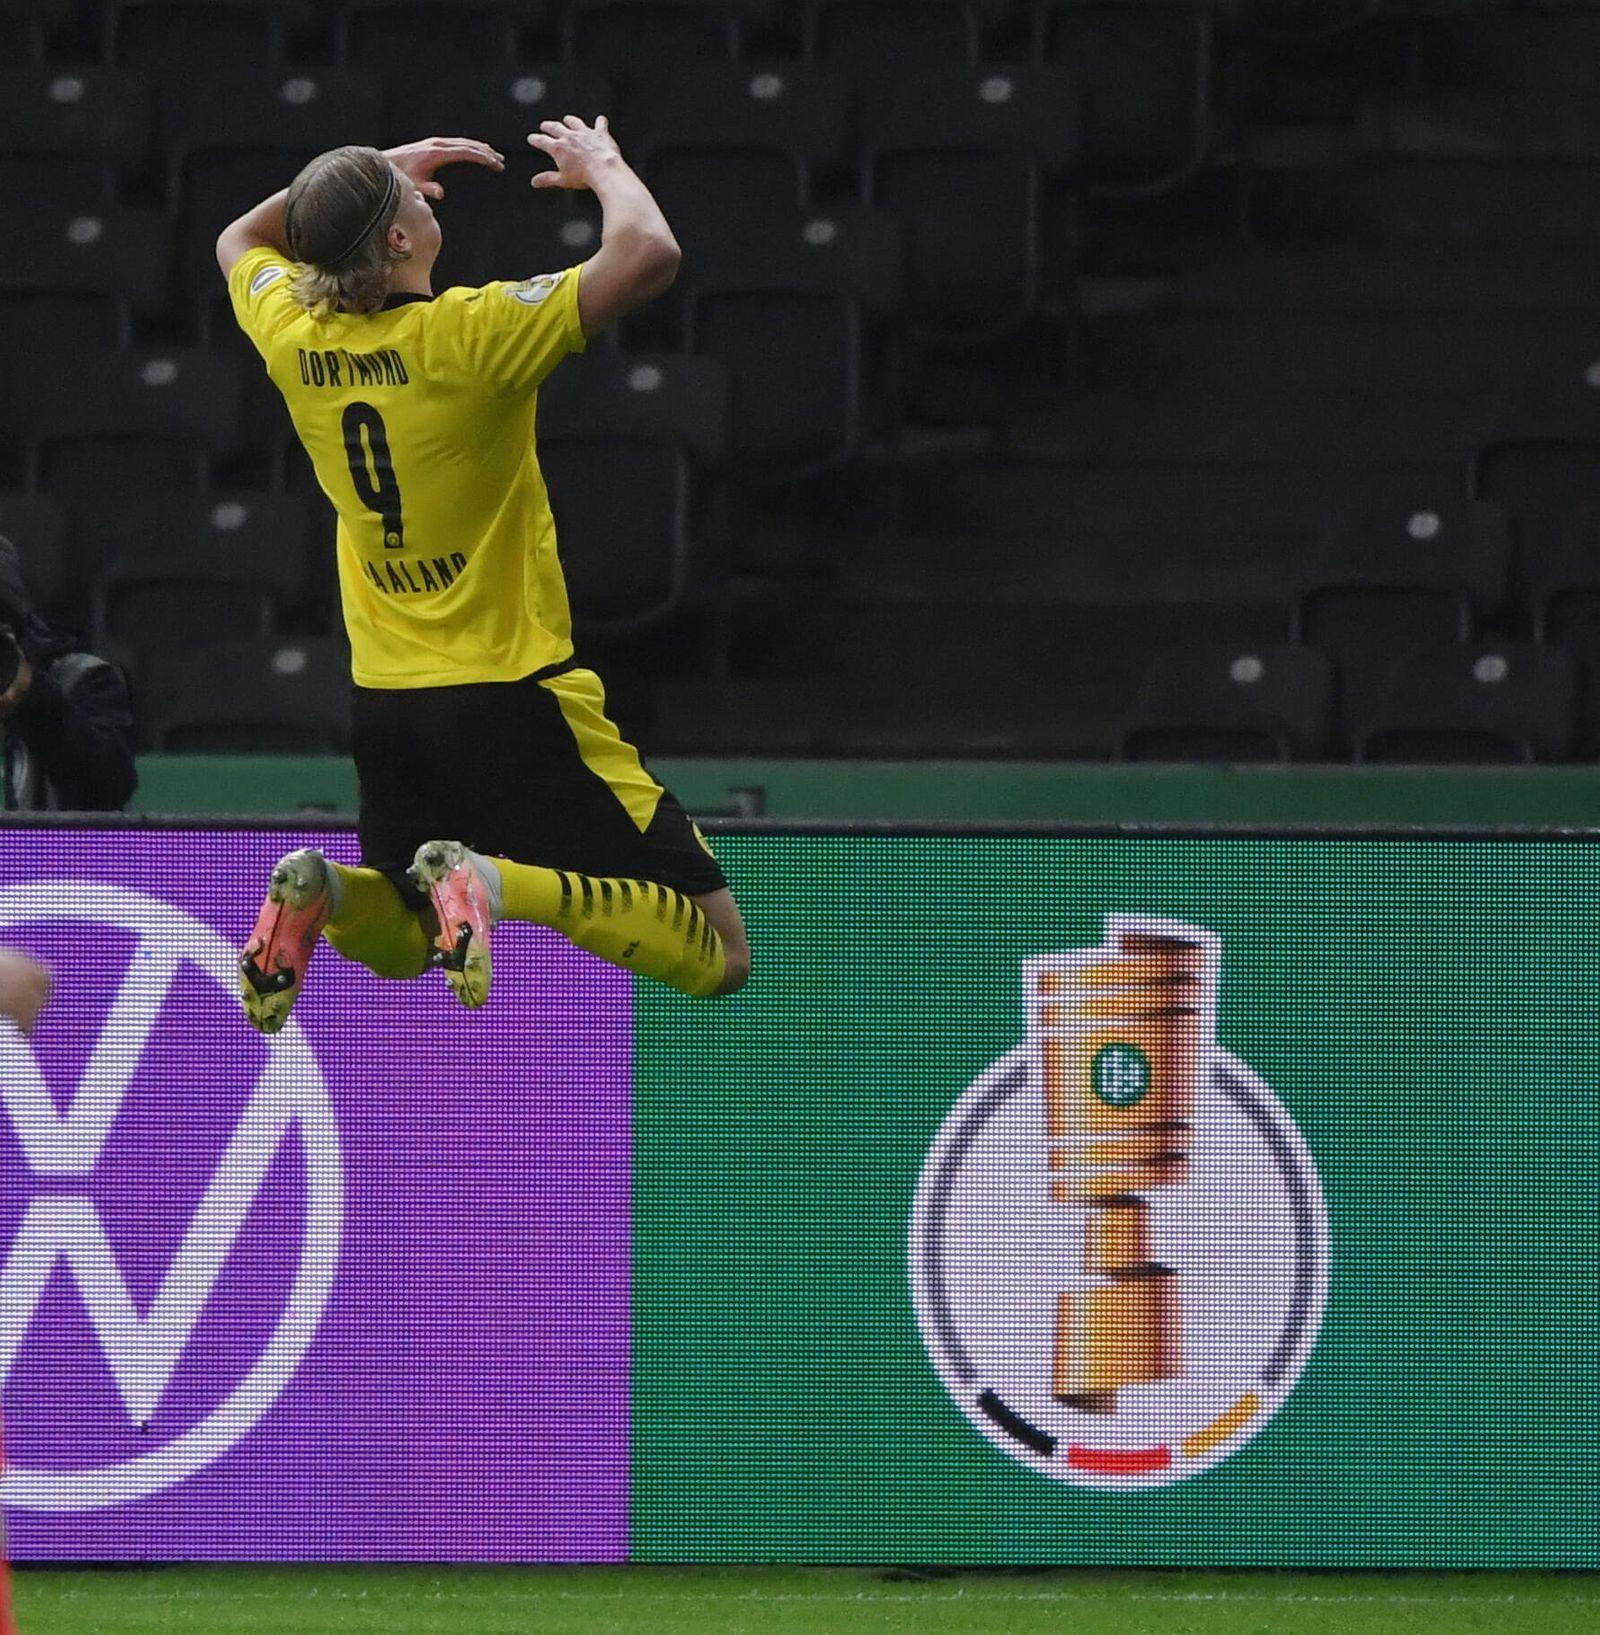 Jubelsprung Erling Haaland (Borussia Dortmund) 13.05.2021, Fussball GER, Saison 2020 2021, DFB Pokal, Finale in Berlin,